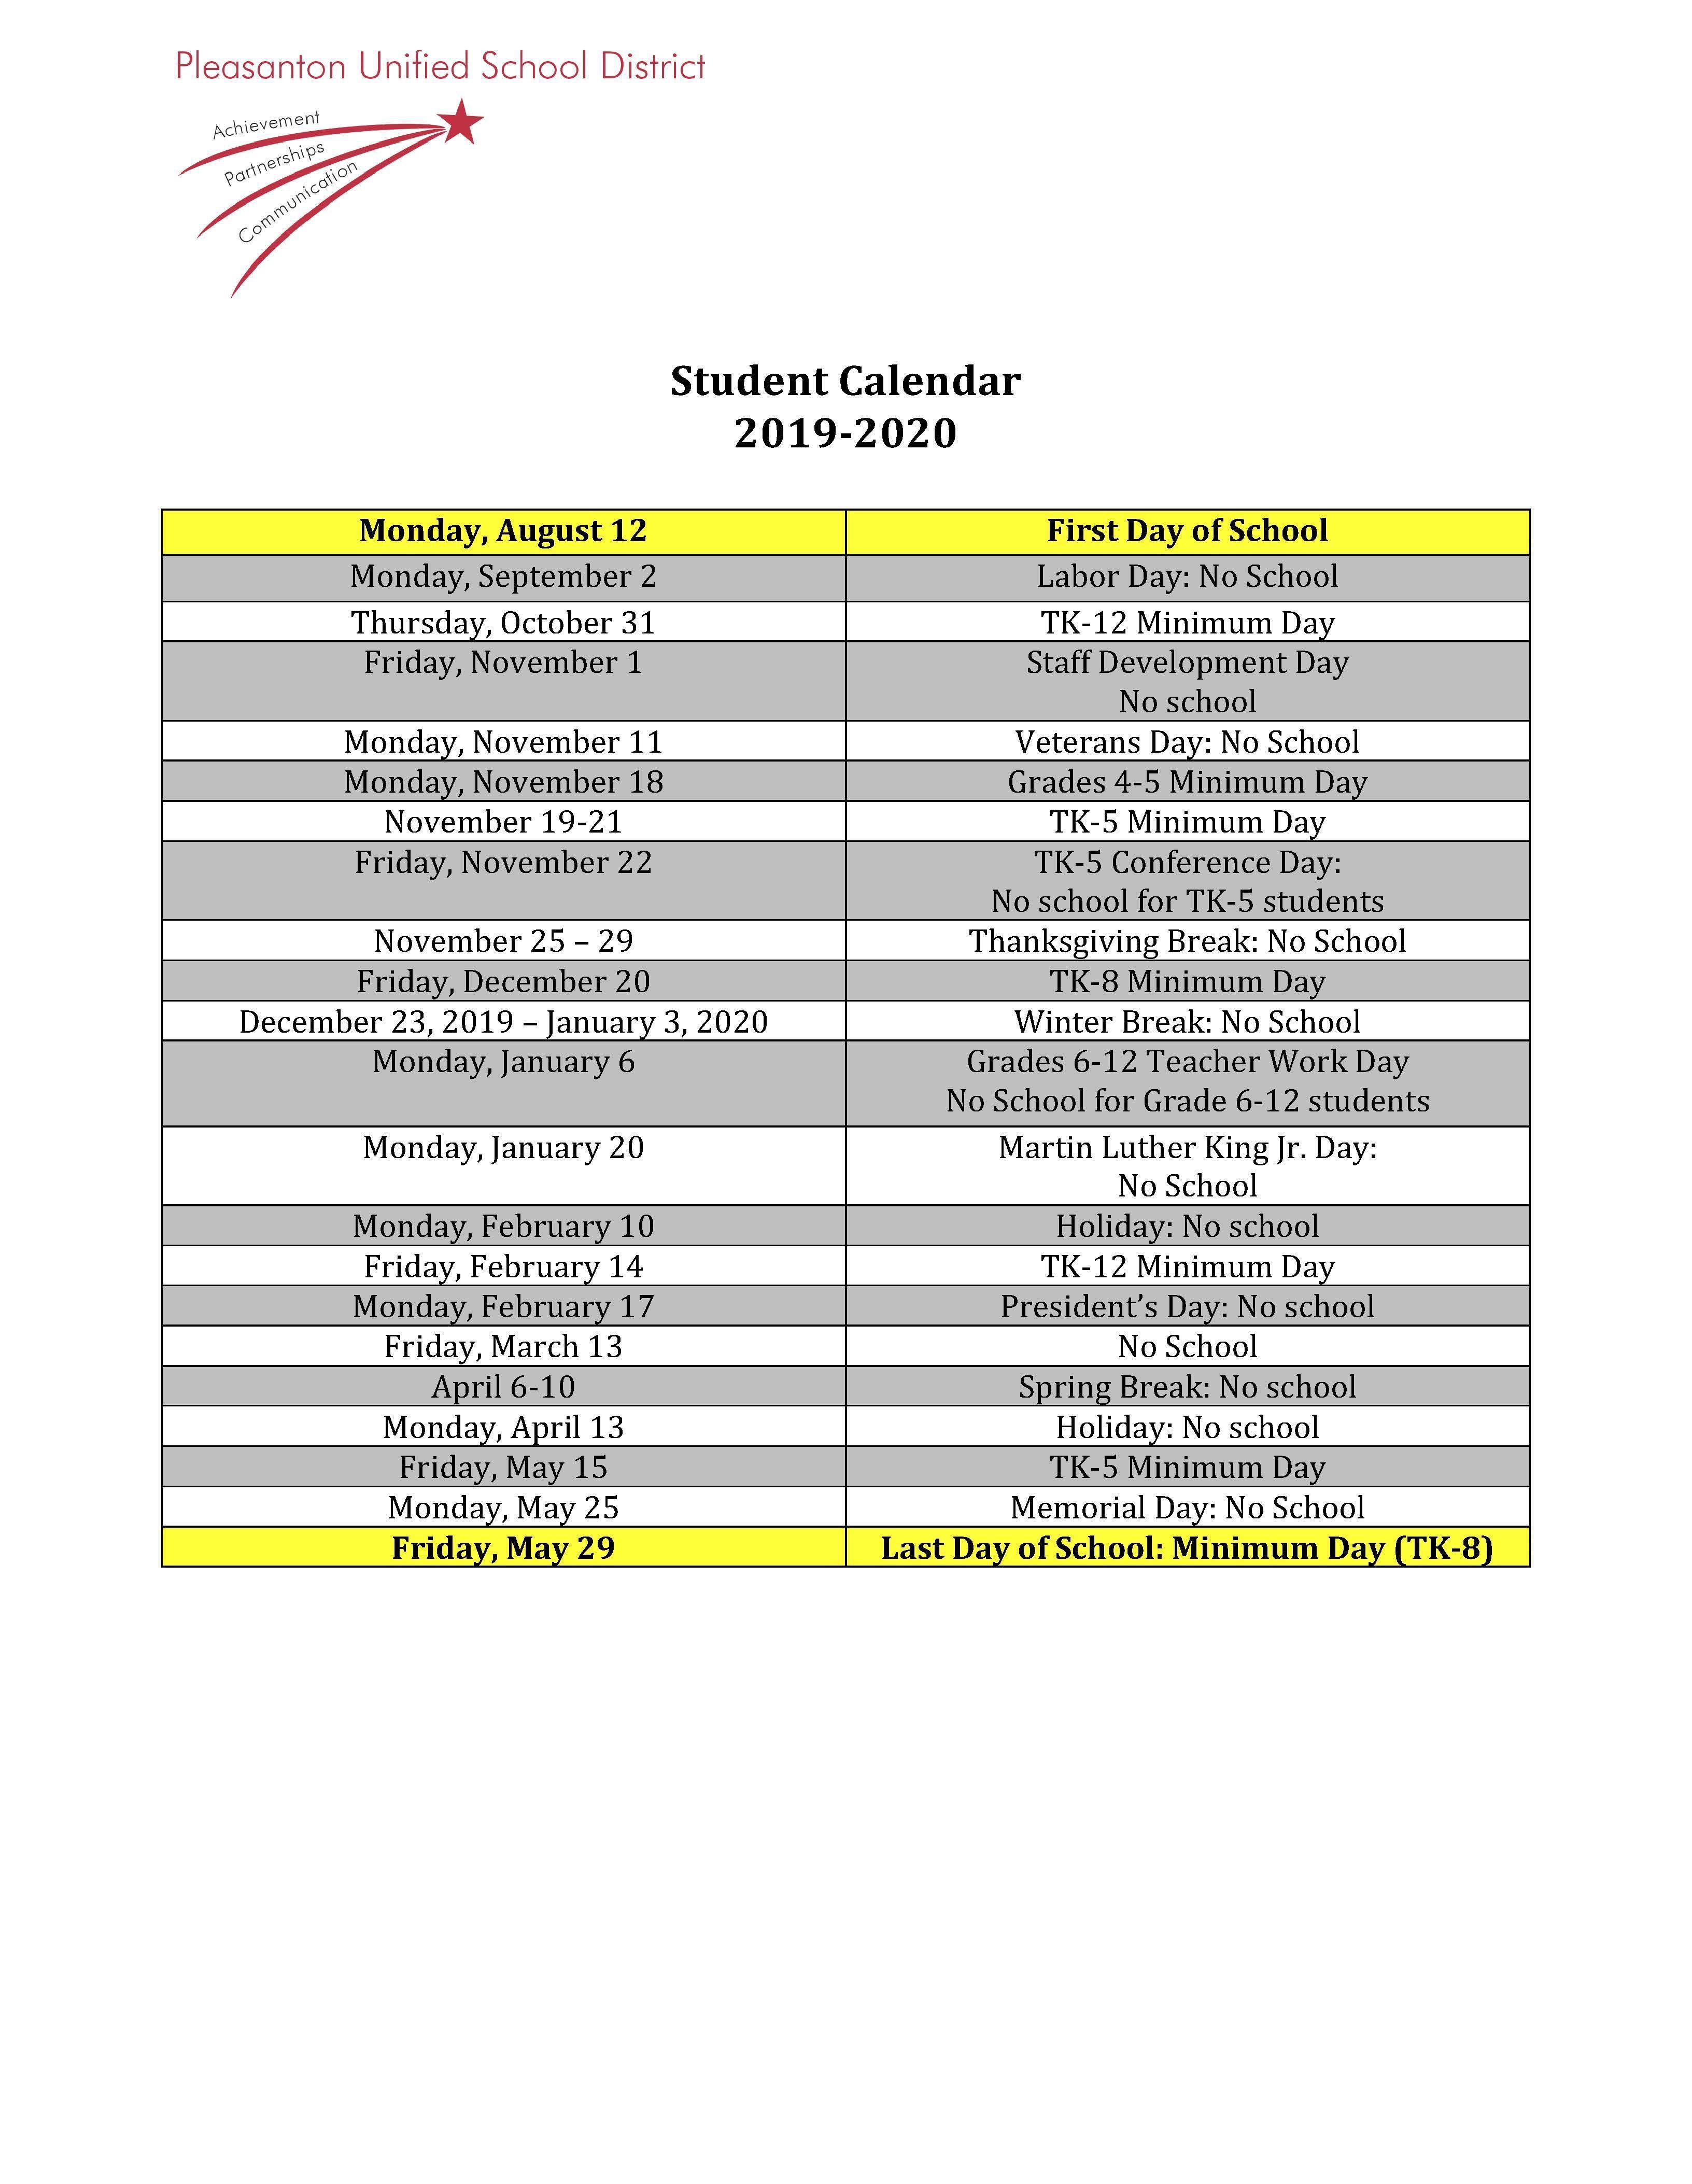 Calendars - Miscellaneous - Pleasanton Unified School District For Bay City Public Schools Calender 2021 2020